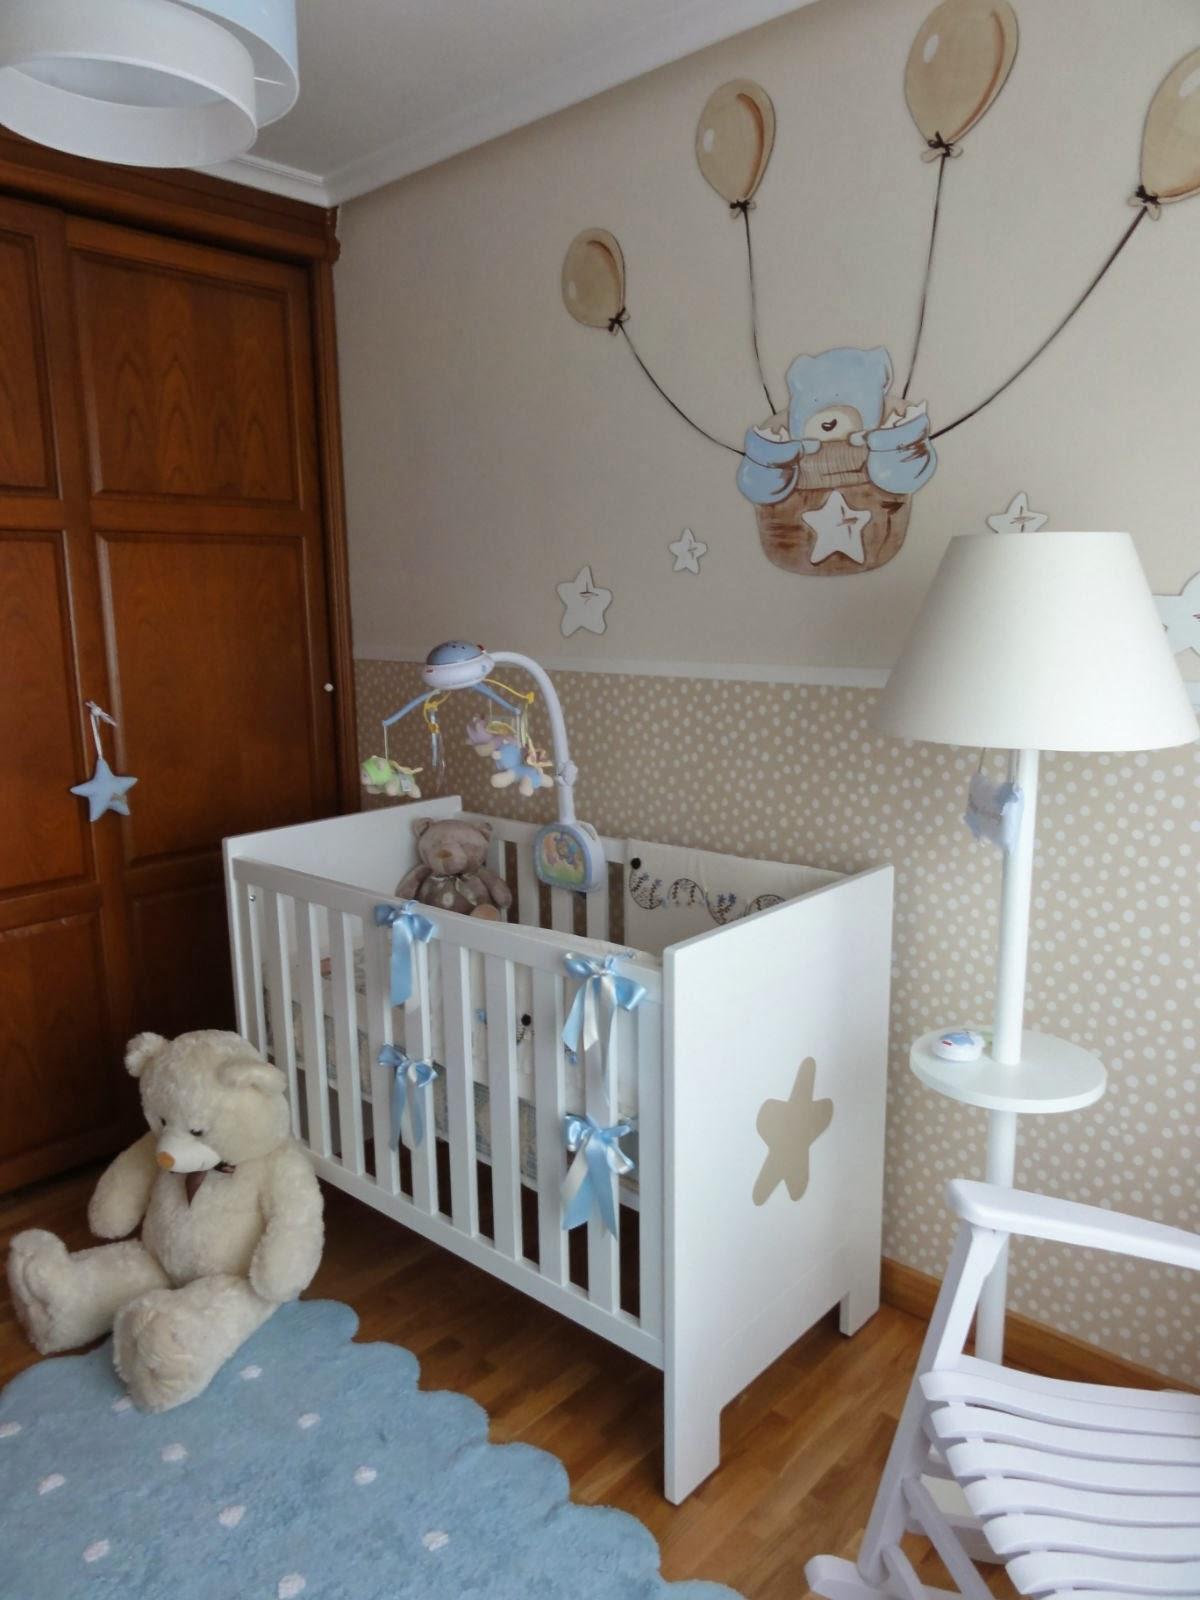 O blog d 39 a janelinha cores para quarto de beb azul - Papel para habitacion de bebe ...